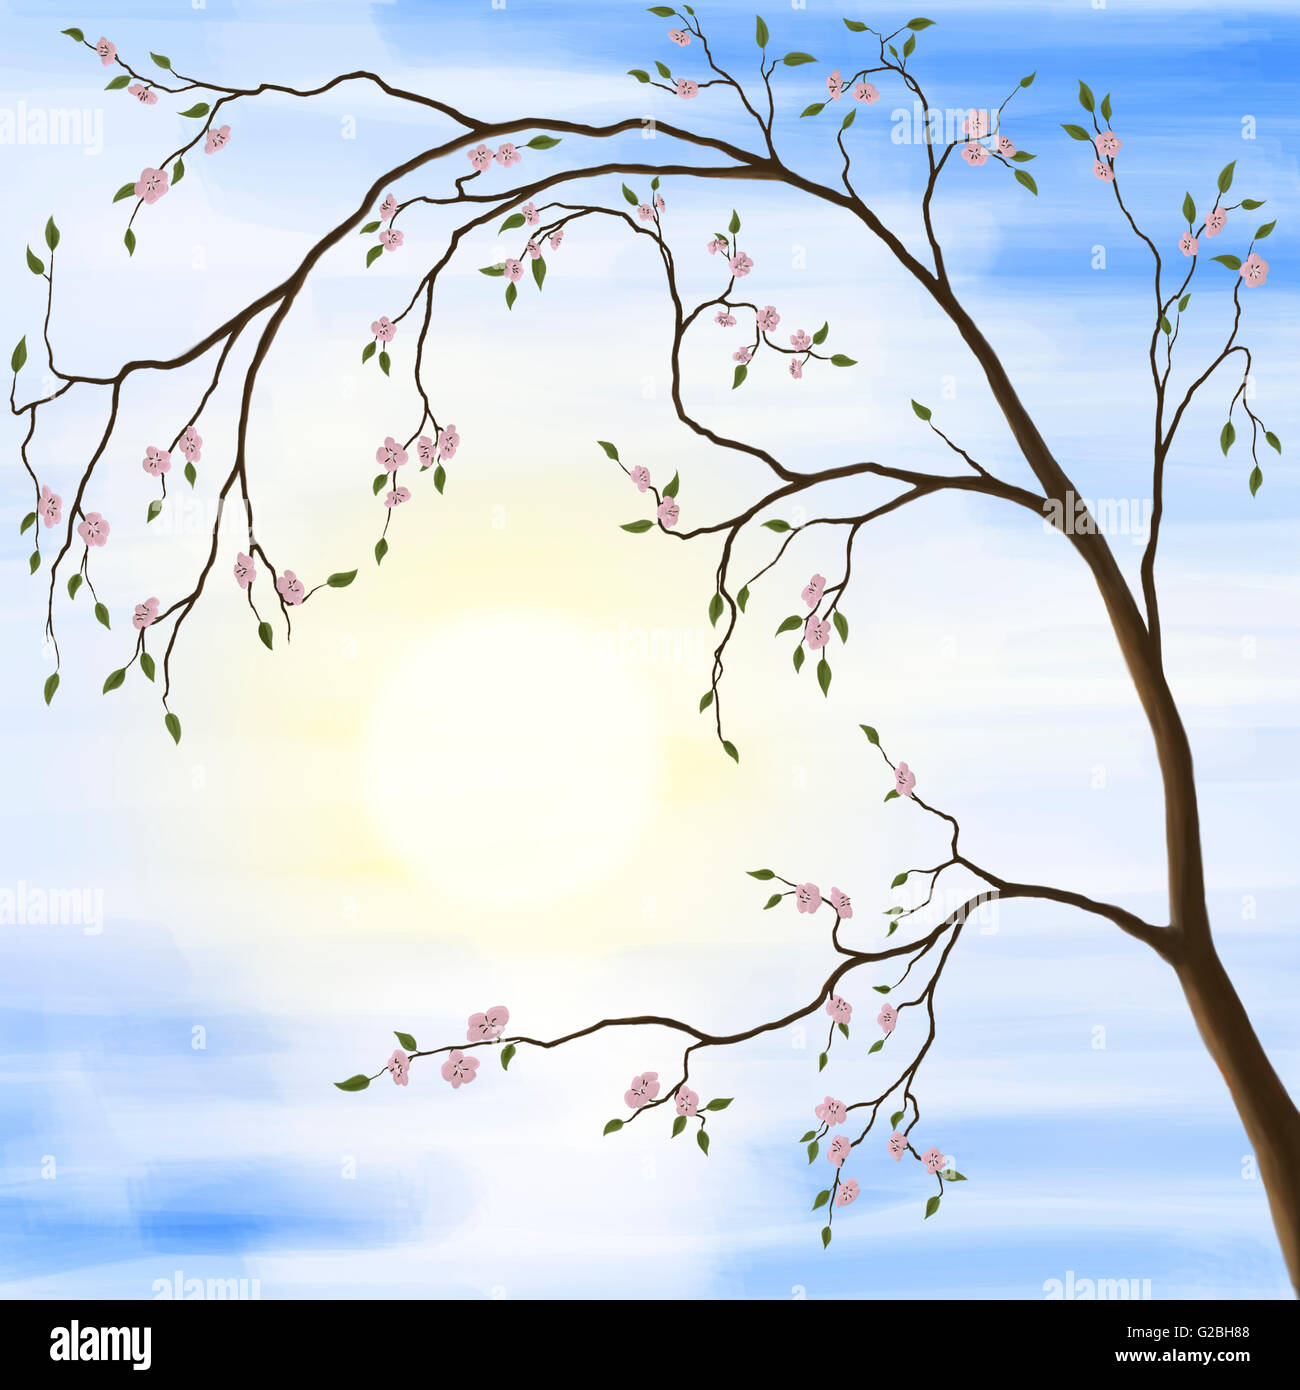 Sakura cherry blossom, illustration - Stock Image